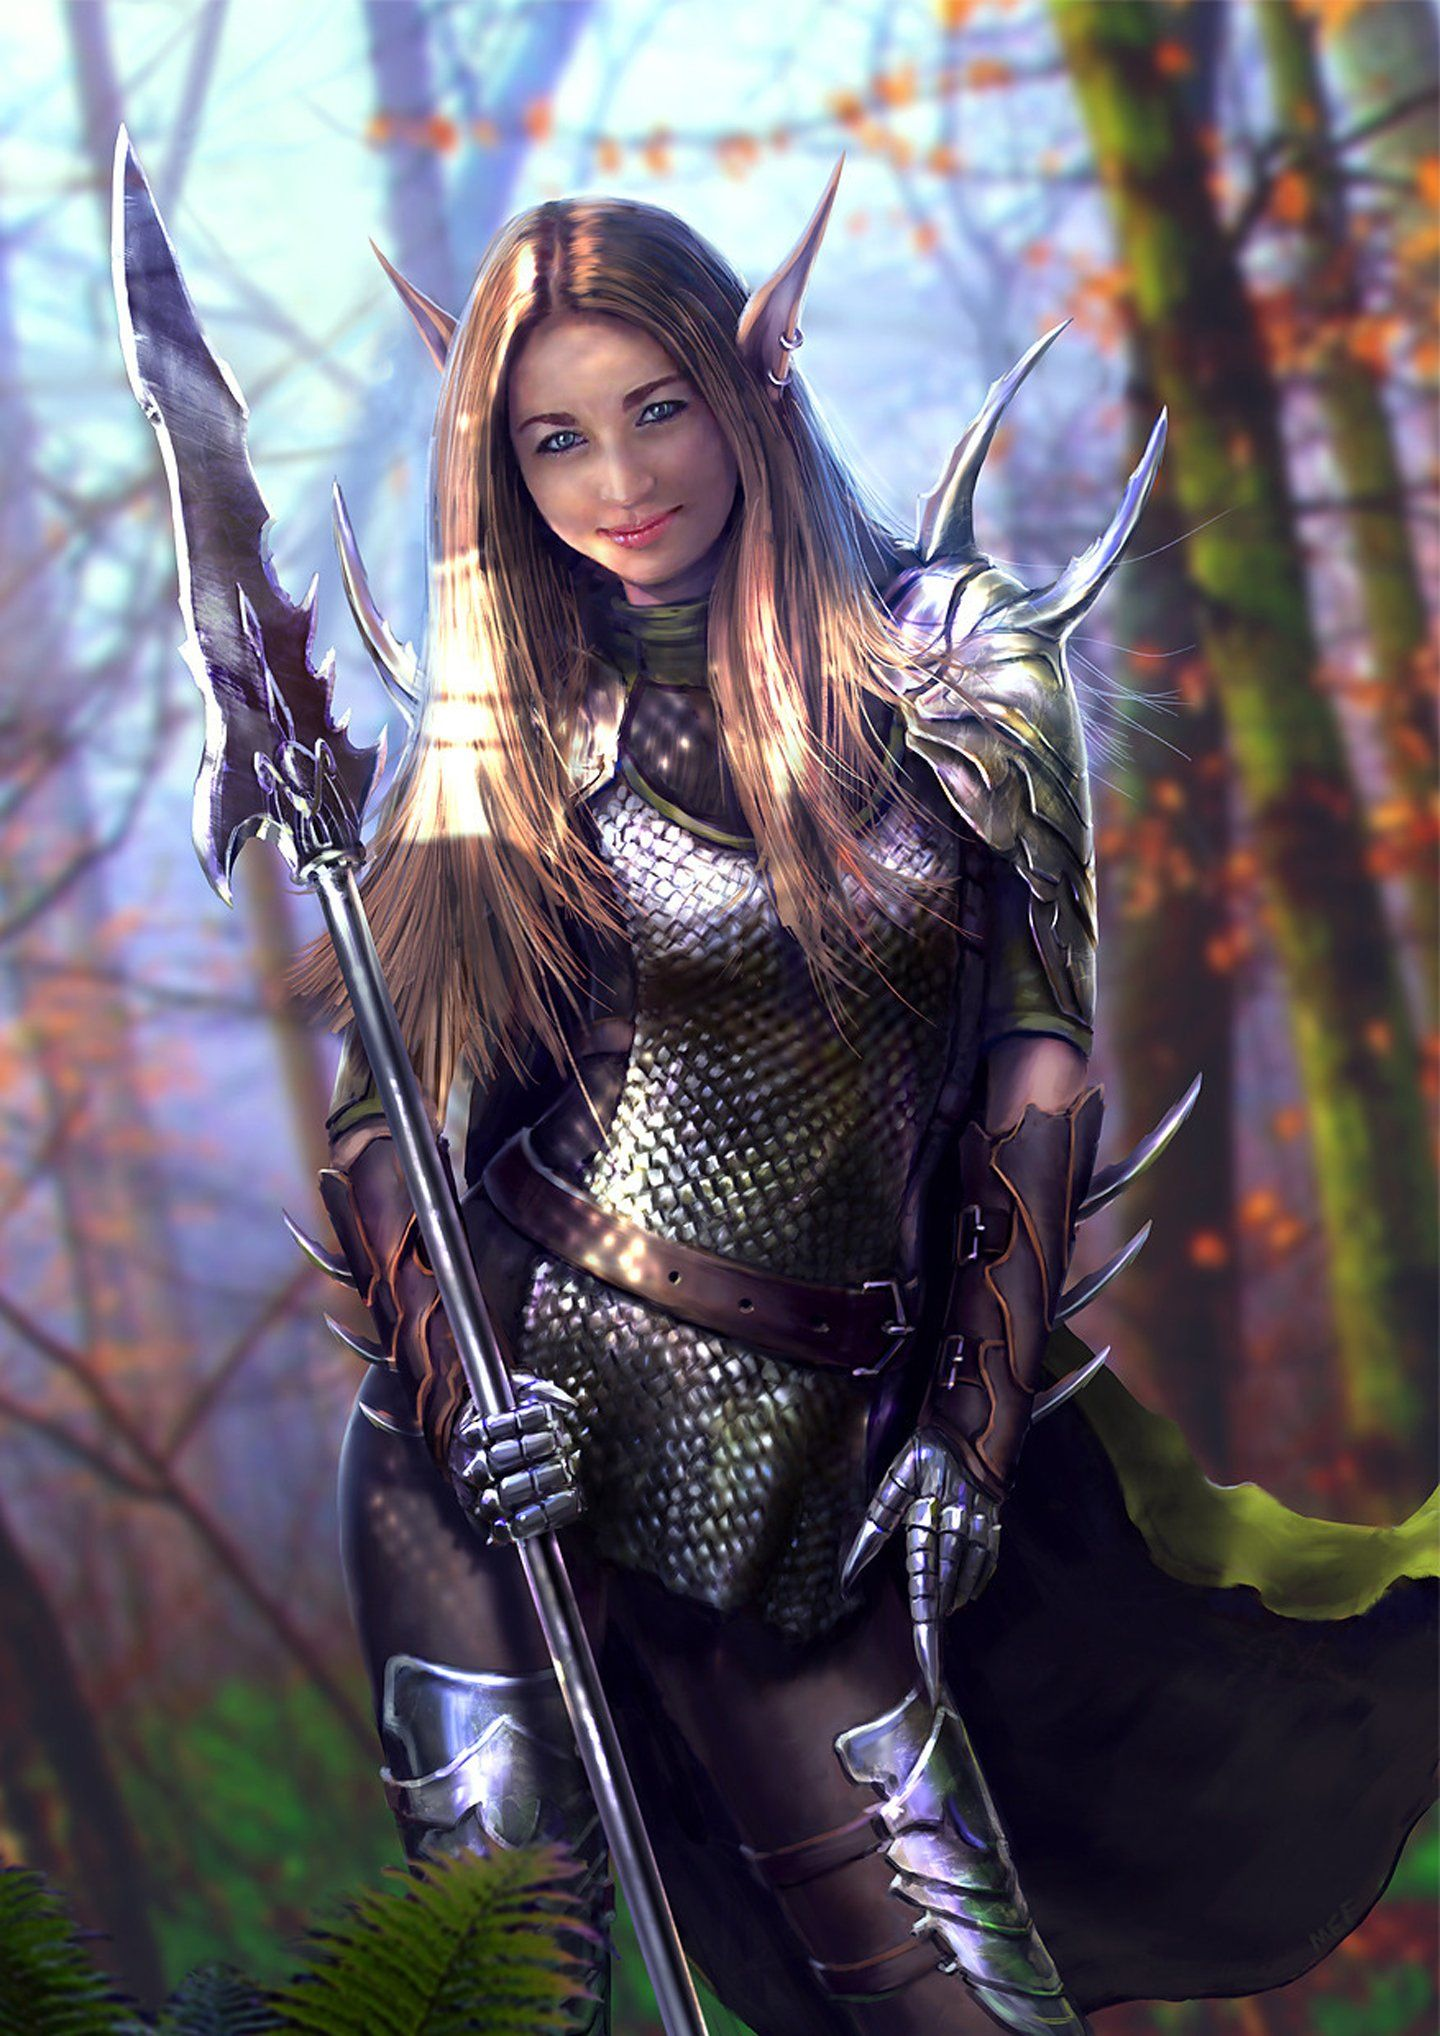 Fantasy Armor Elf Girl Warrior Wallpaper 1440x2036 746128 Female Elf Warrior Girl Elf Warrior